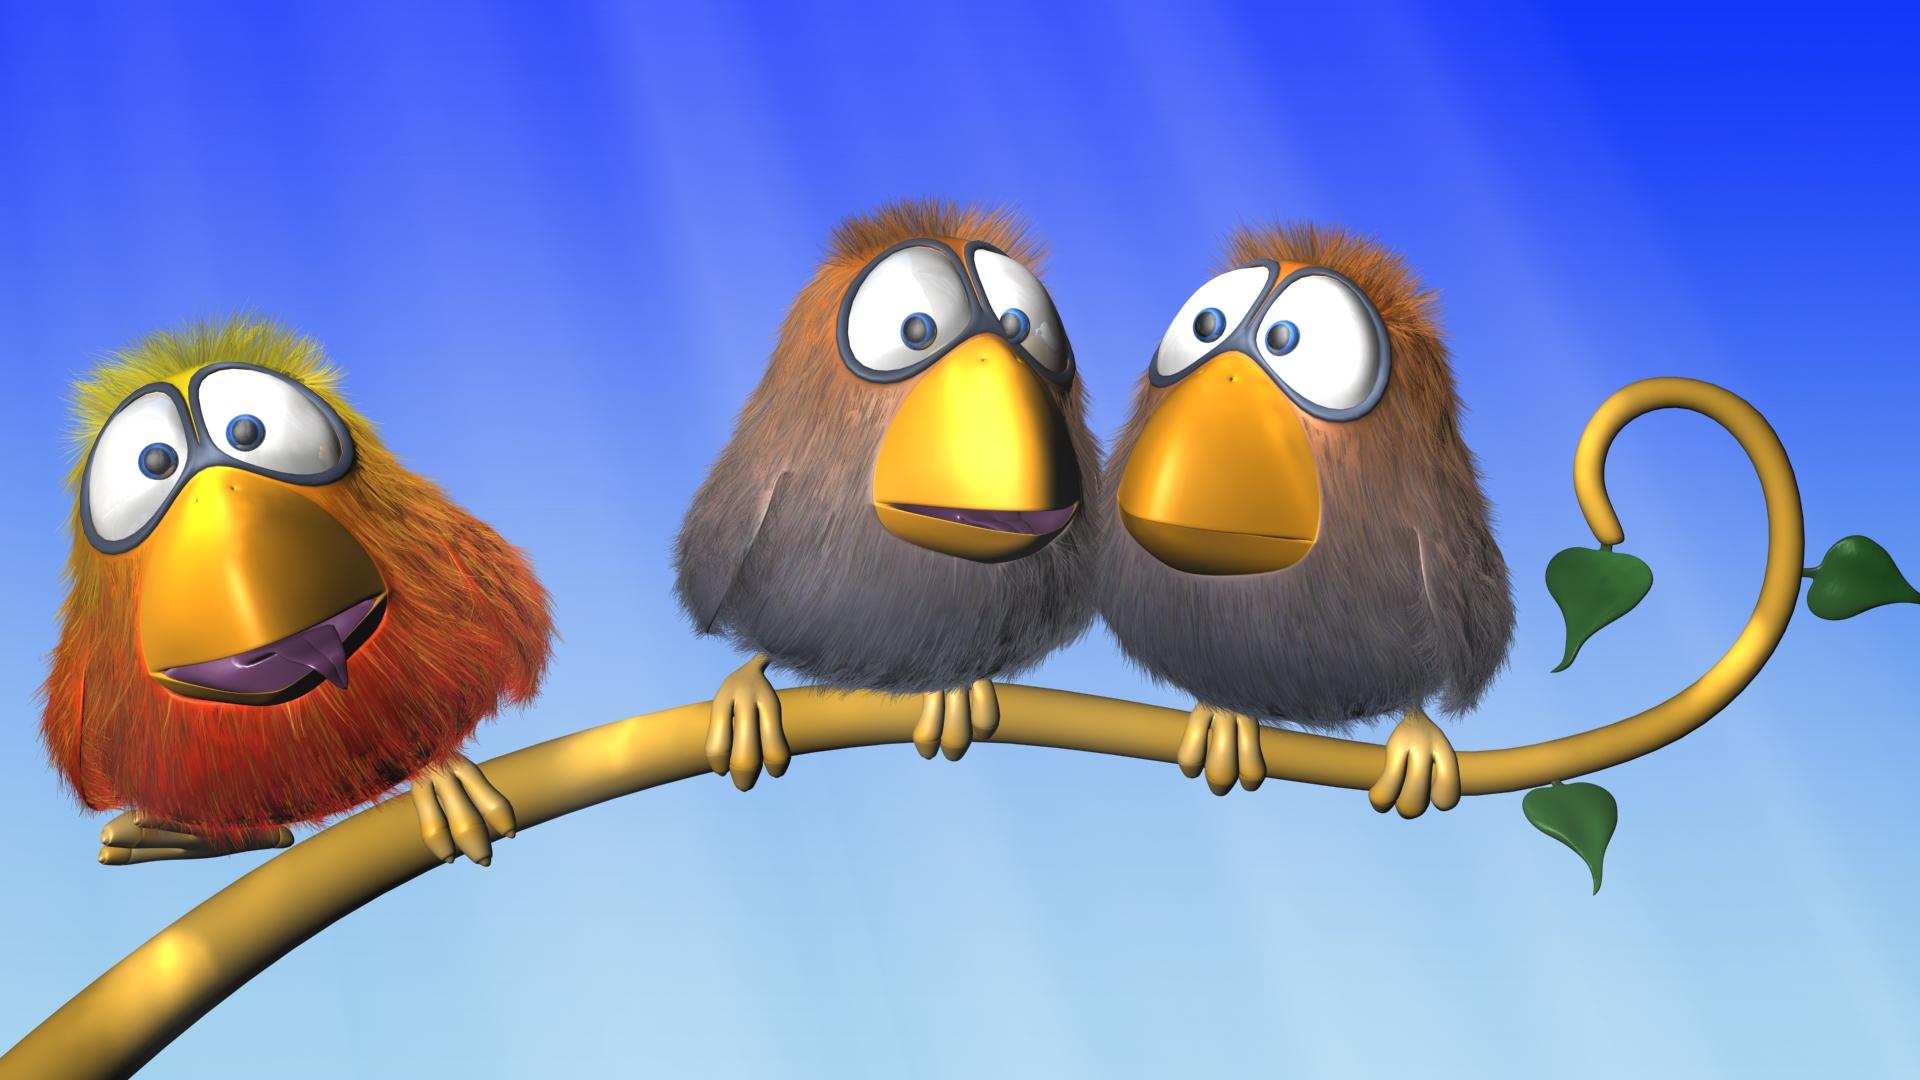 Papel De Parede Cartoon: Cartoon Birds Full HD Papel De Parede And Planos De Fundo